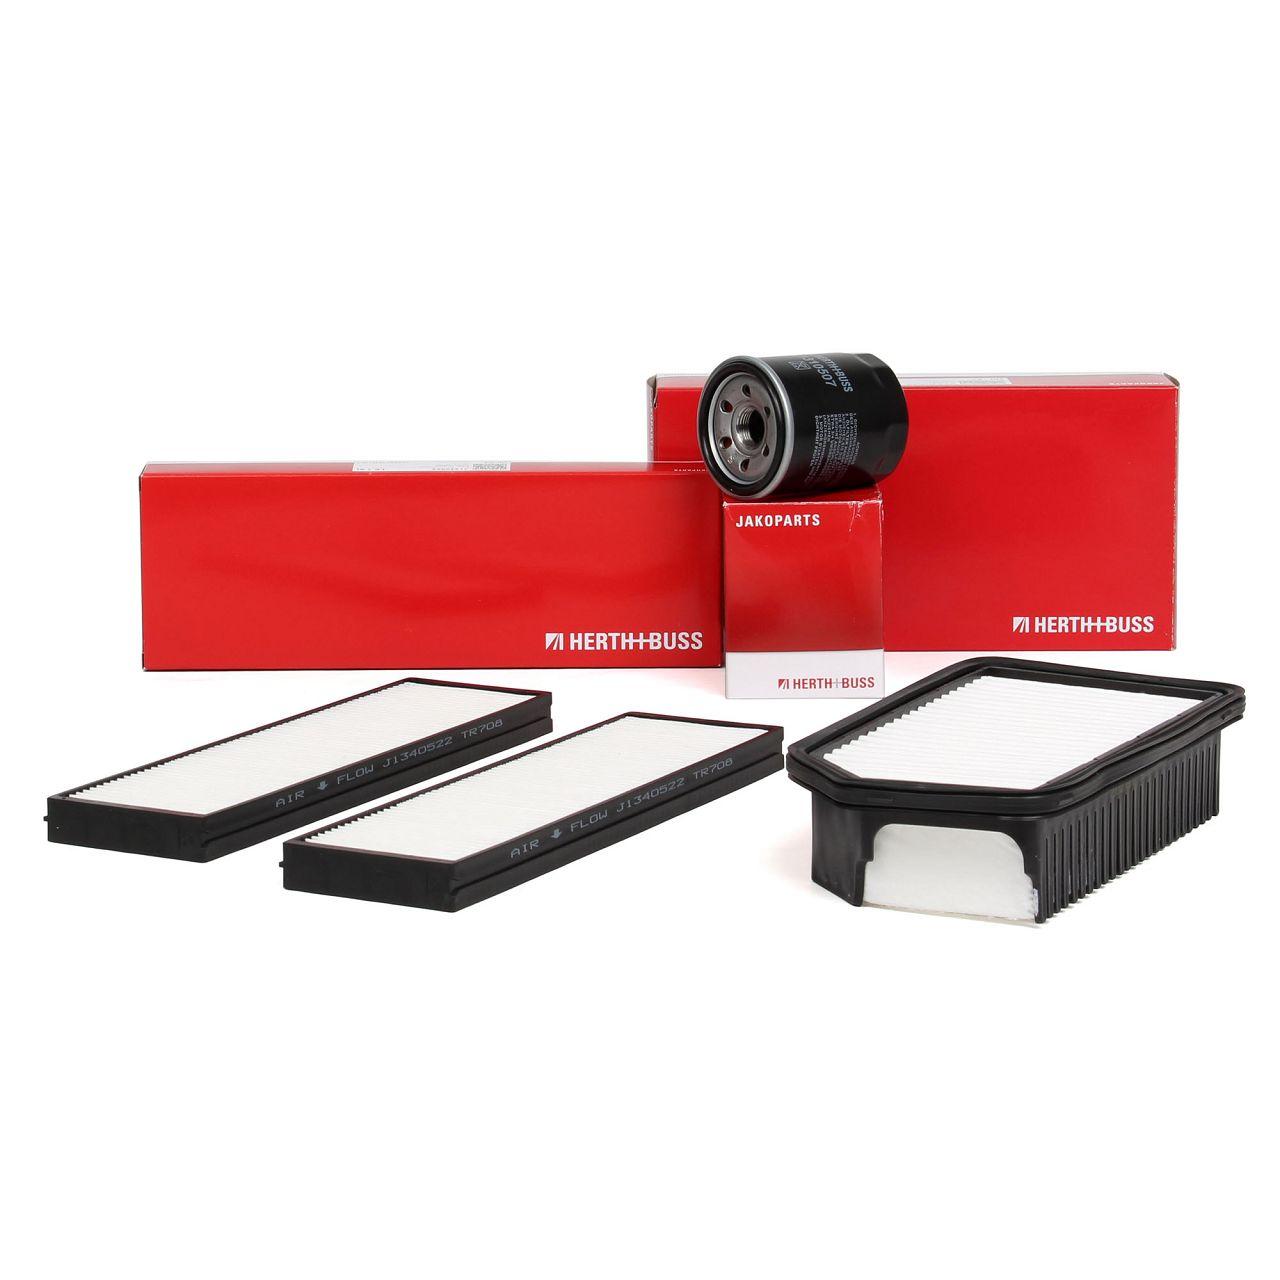 HERTH+BUSS JAKOPARTS Filterpaket Filterset für HYUNDAI i20 (PB, PBT) 1.2 78 PS